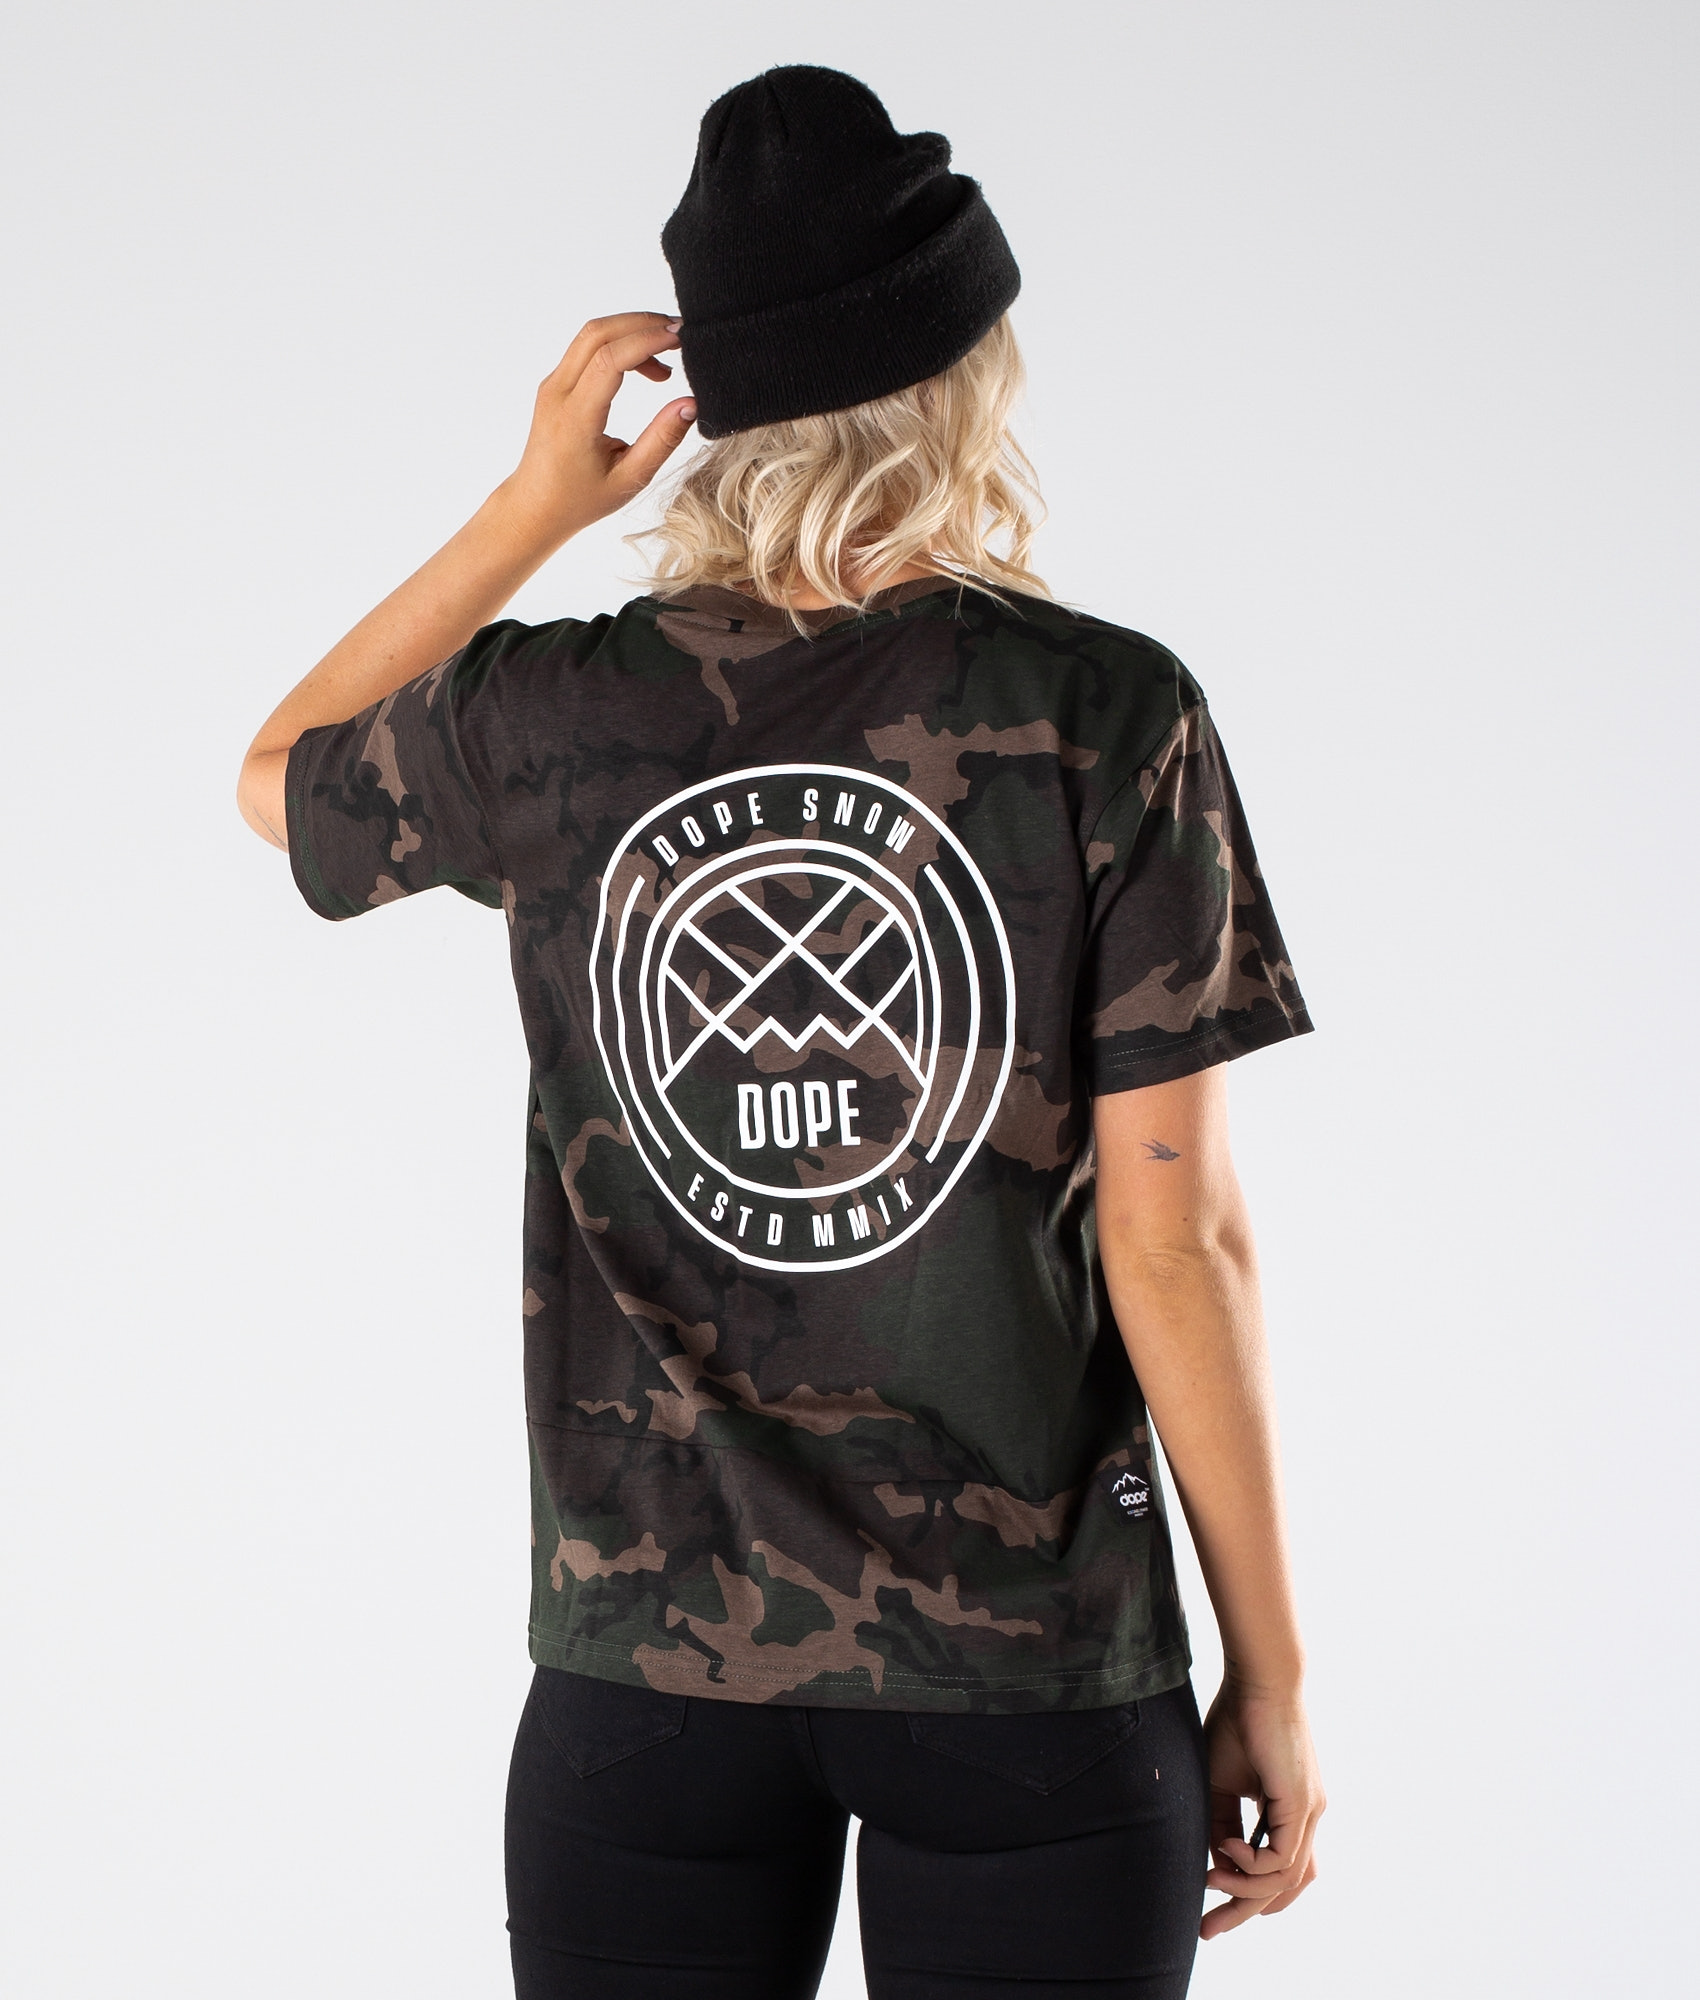 e5fcff8a3beb1 Damen T-Shirts Streetwear